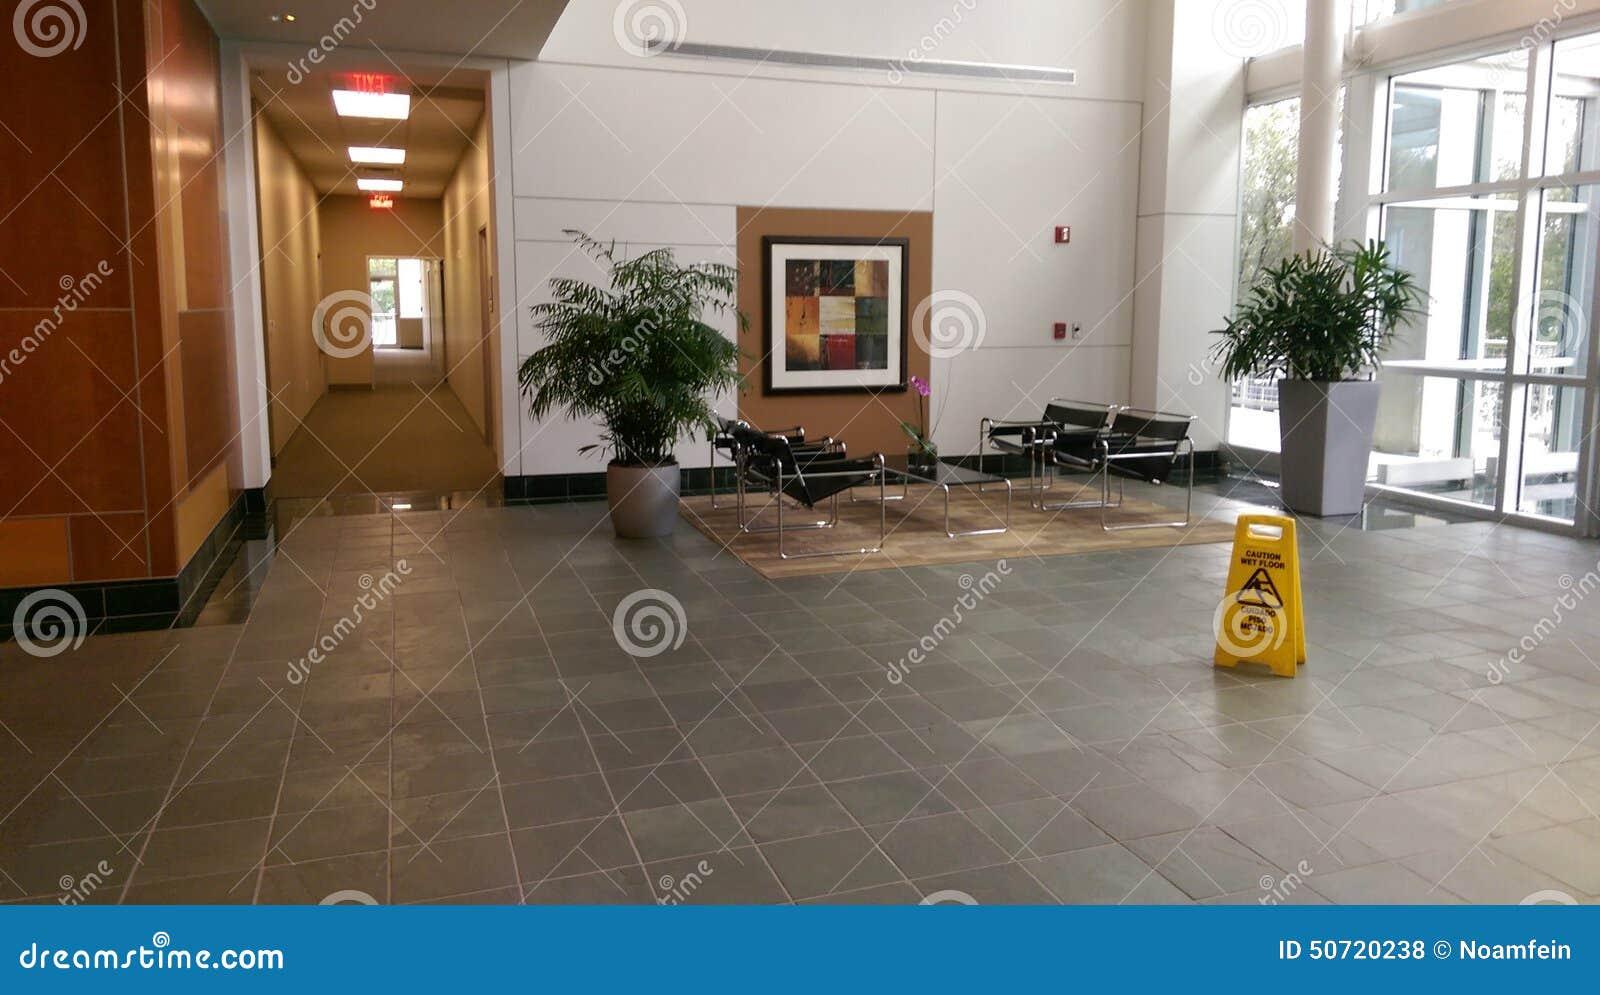 Building Lobby Editorial Stock Photo Image 50720238